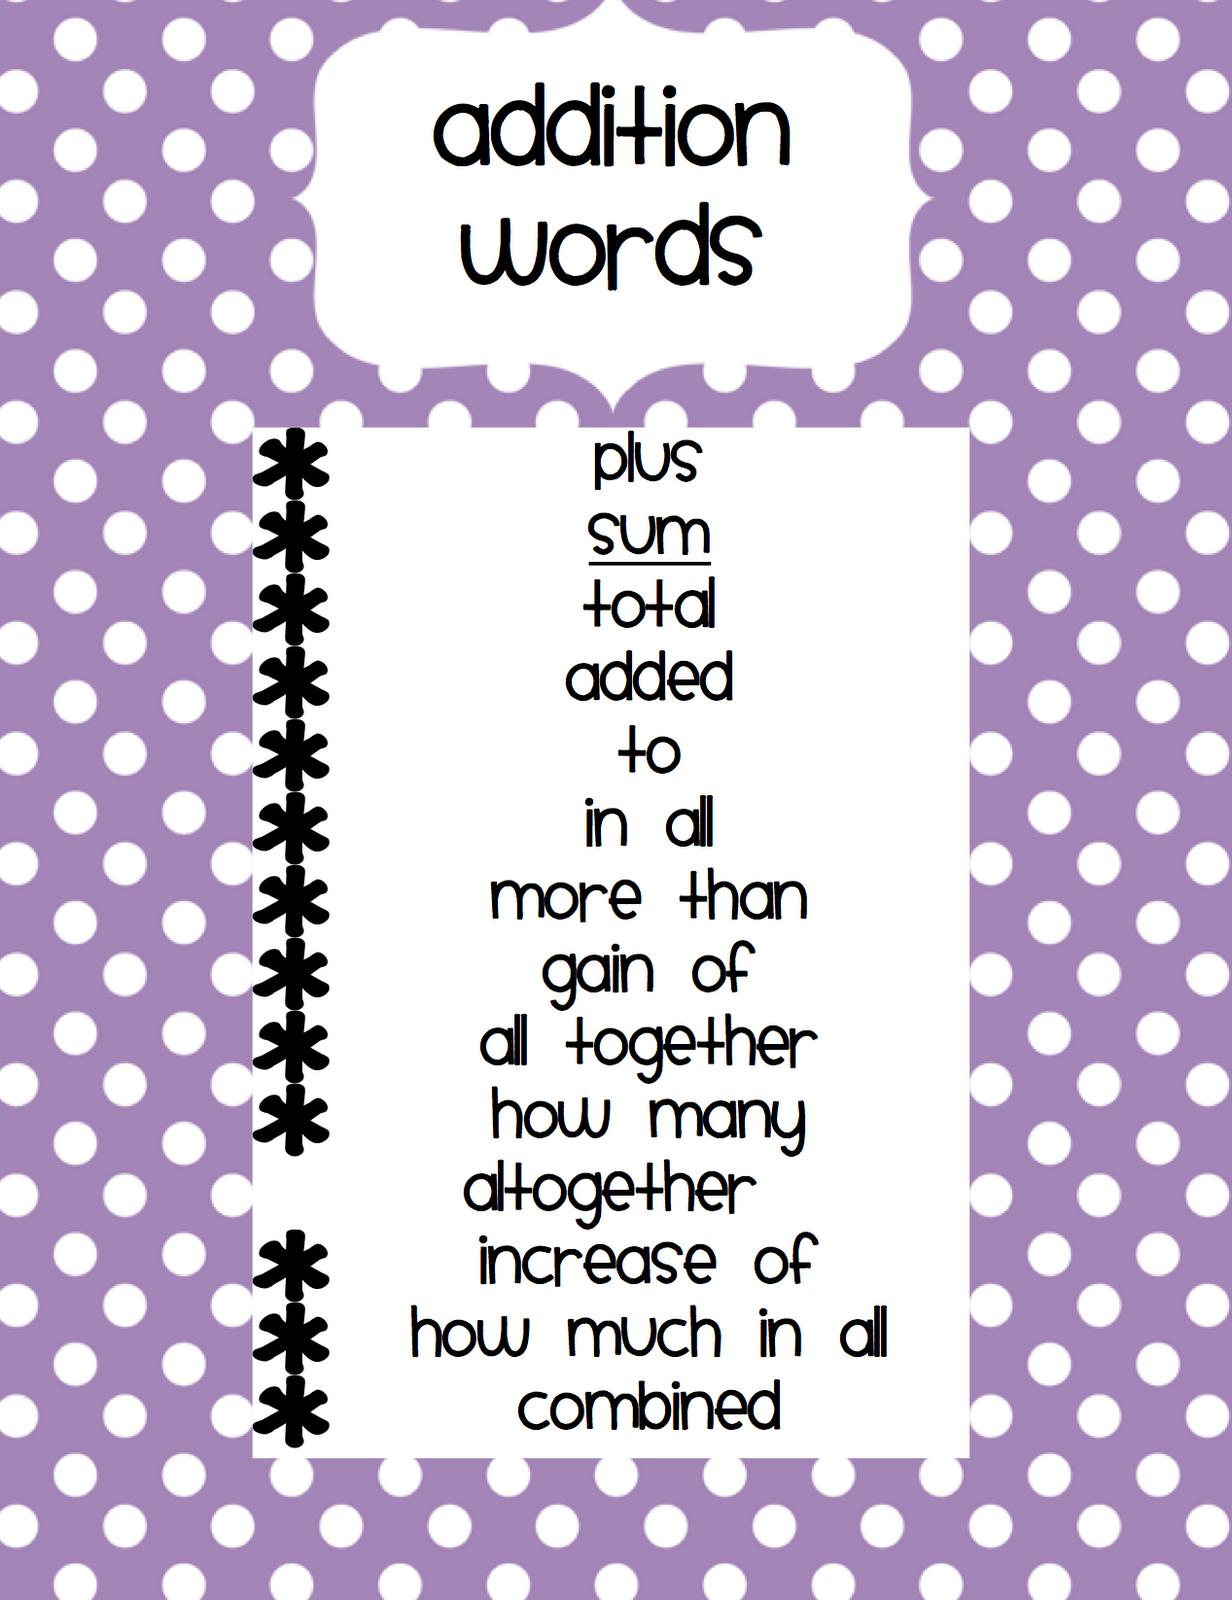 worksheet. Addition Words. Duliziyou Worksheets for Elementary ...